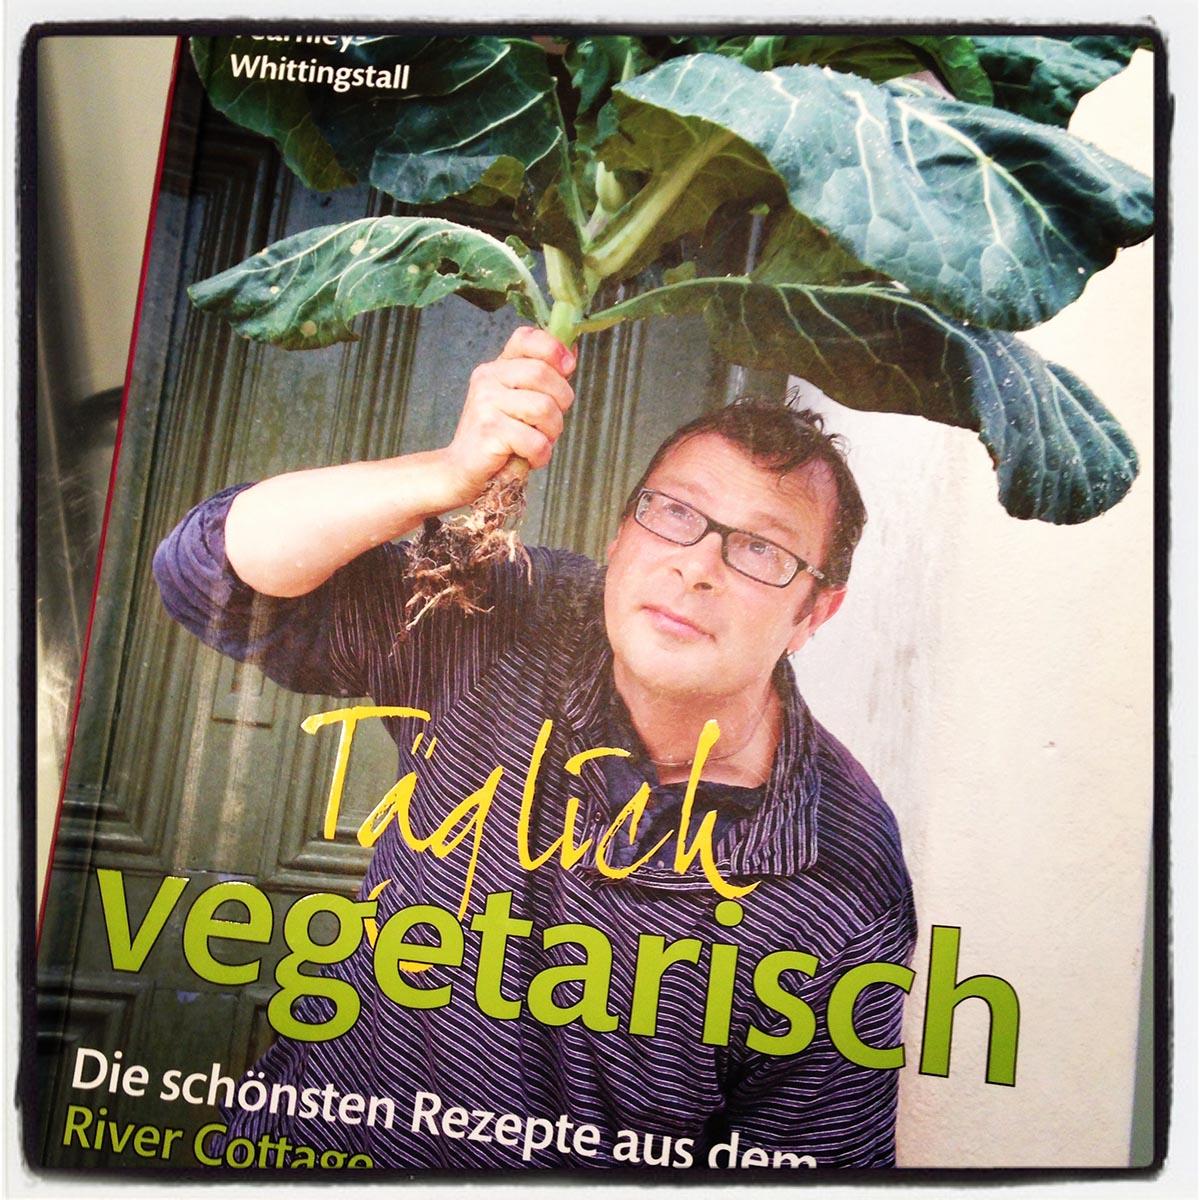 Camilla's vegetarischer Januar!